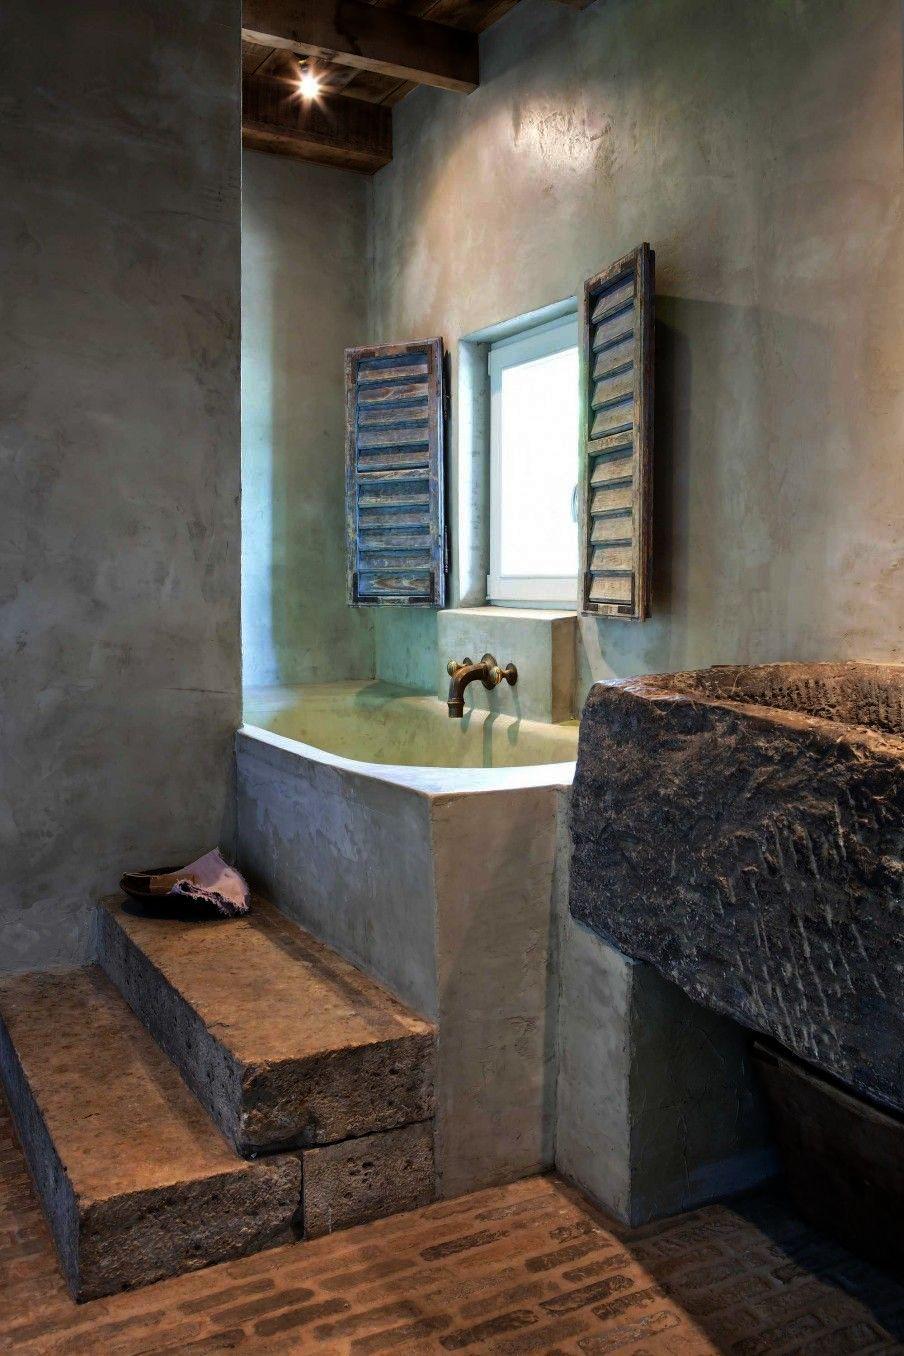 Photo of Bathroom mirror No fog next to bathroom decor Renting both bathrooms Storage Ms. H …